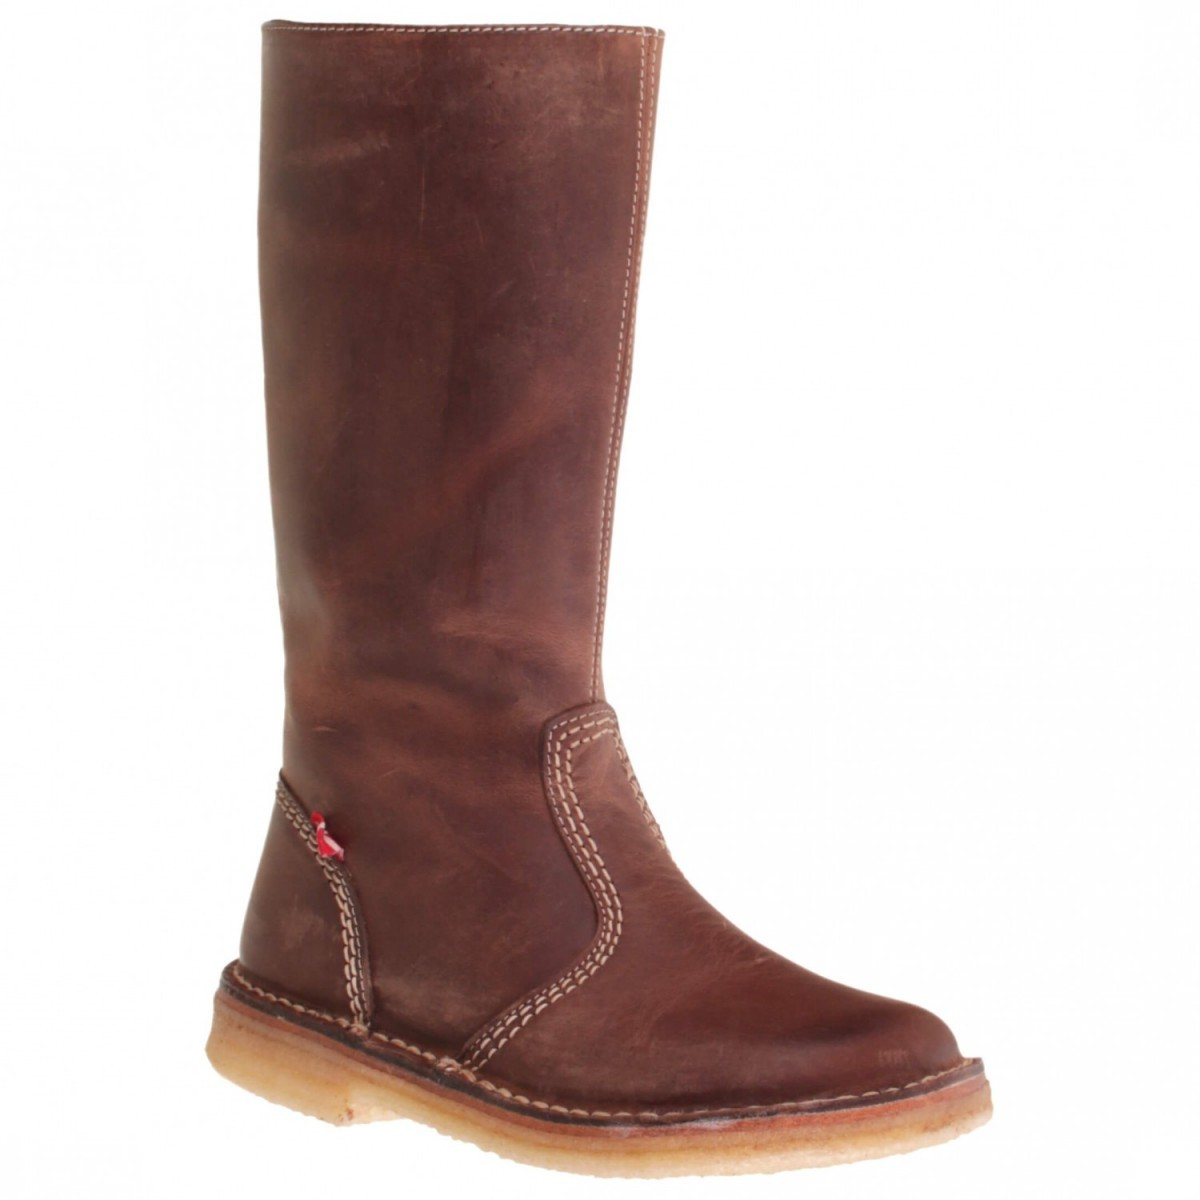 DUCKFEET ダックフィート Vejle ( Cocoa ) ★ 登山靴 ・ 靴 ・ 登山 ・ アウトドアシューズ ・ 山歩き ★